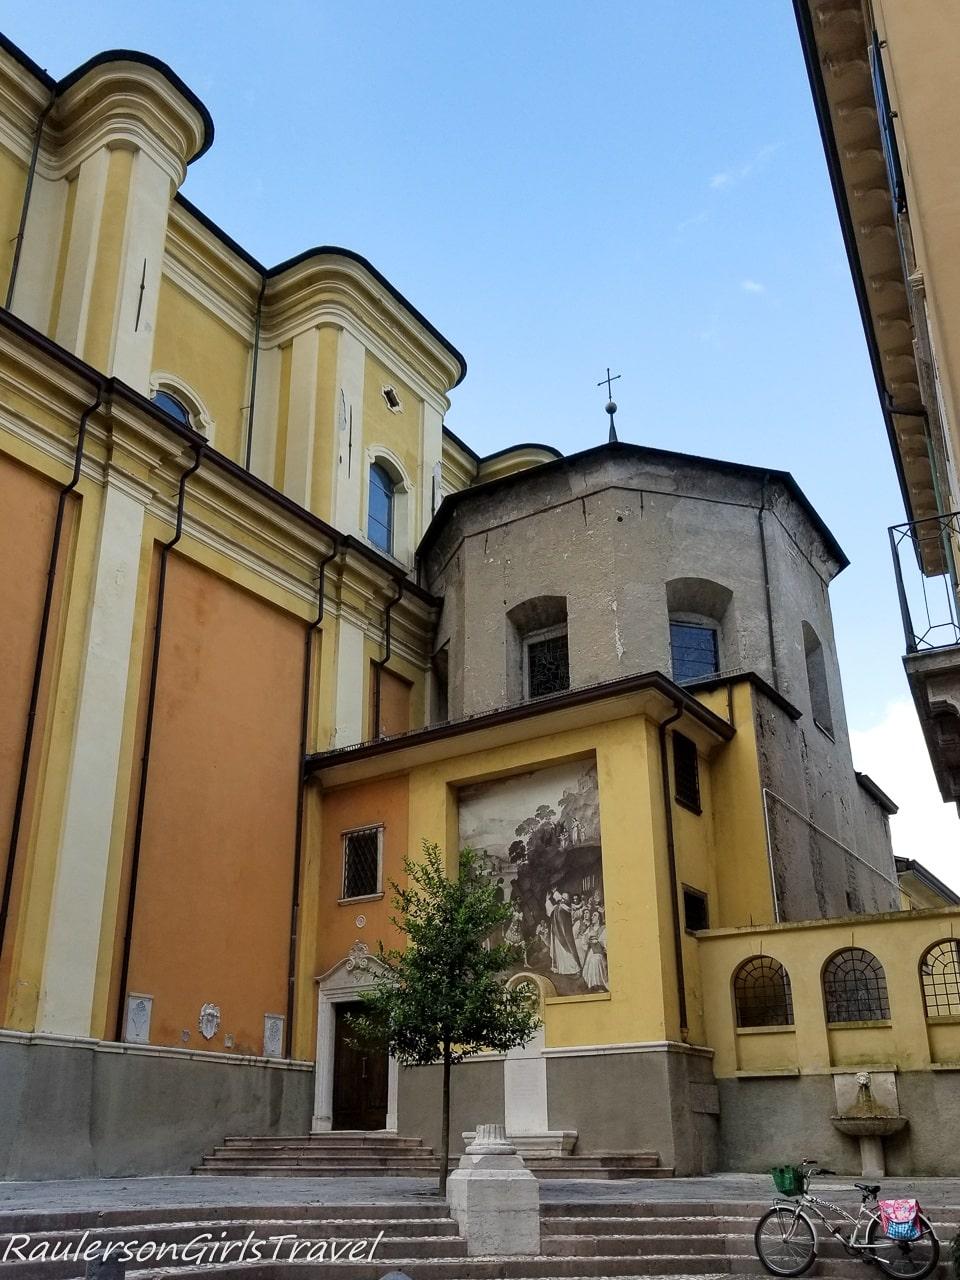 The Santa Maria Assunta Church